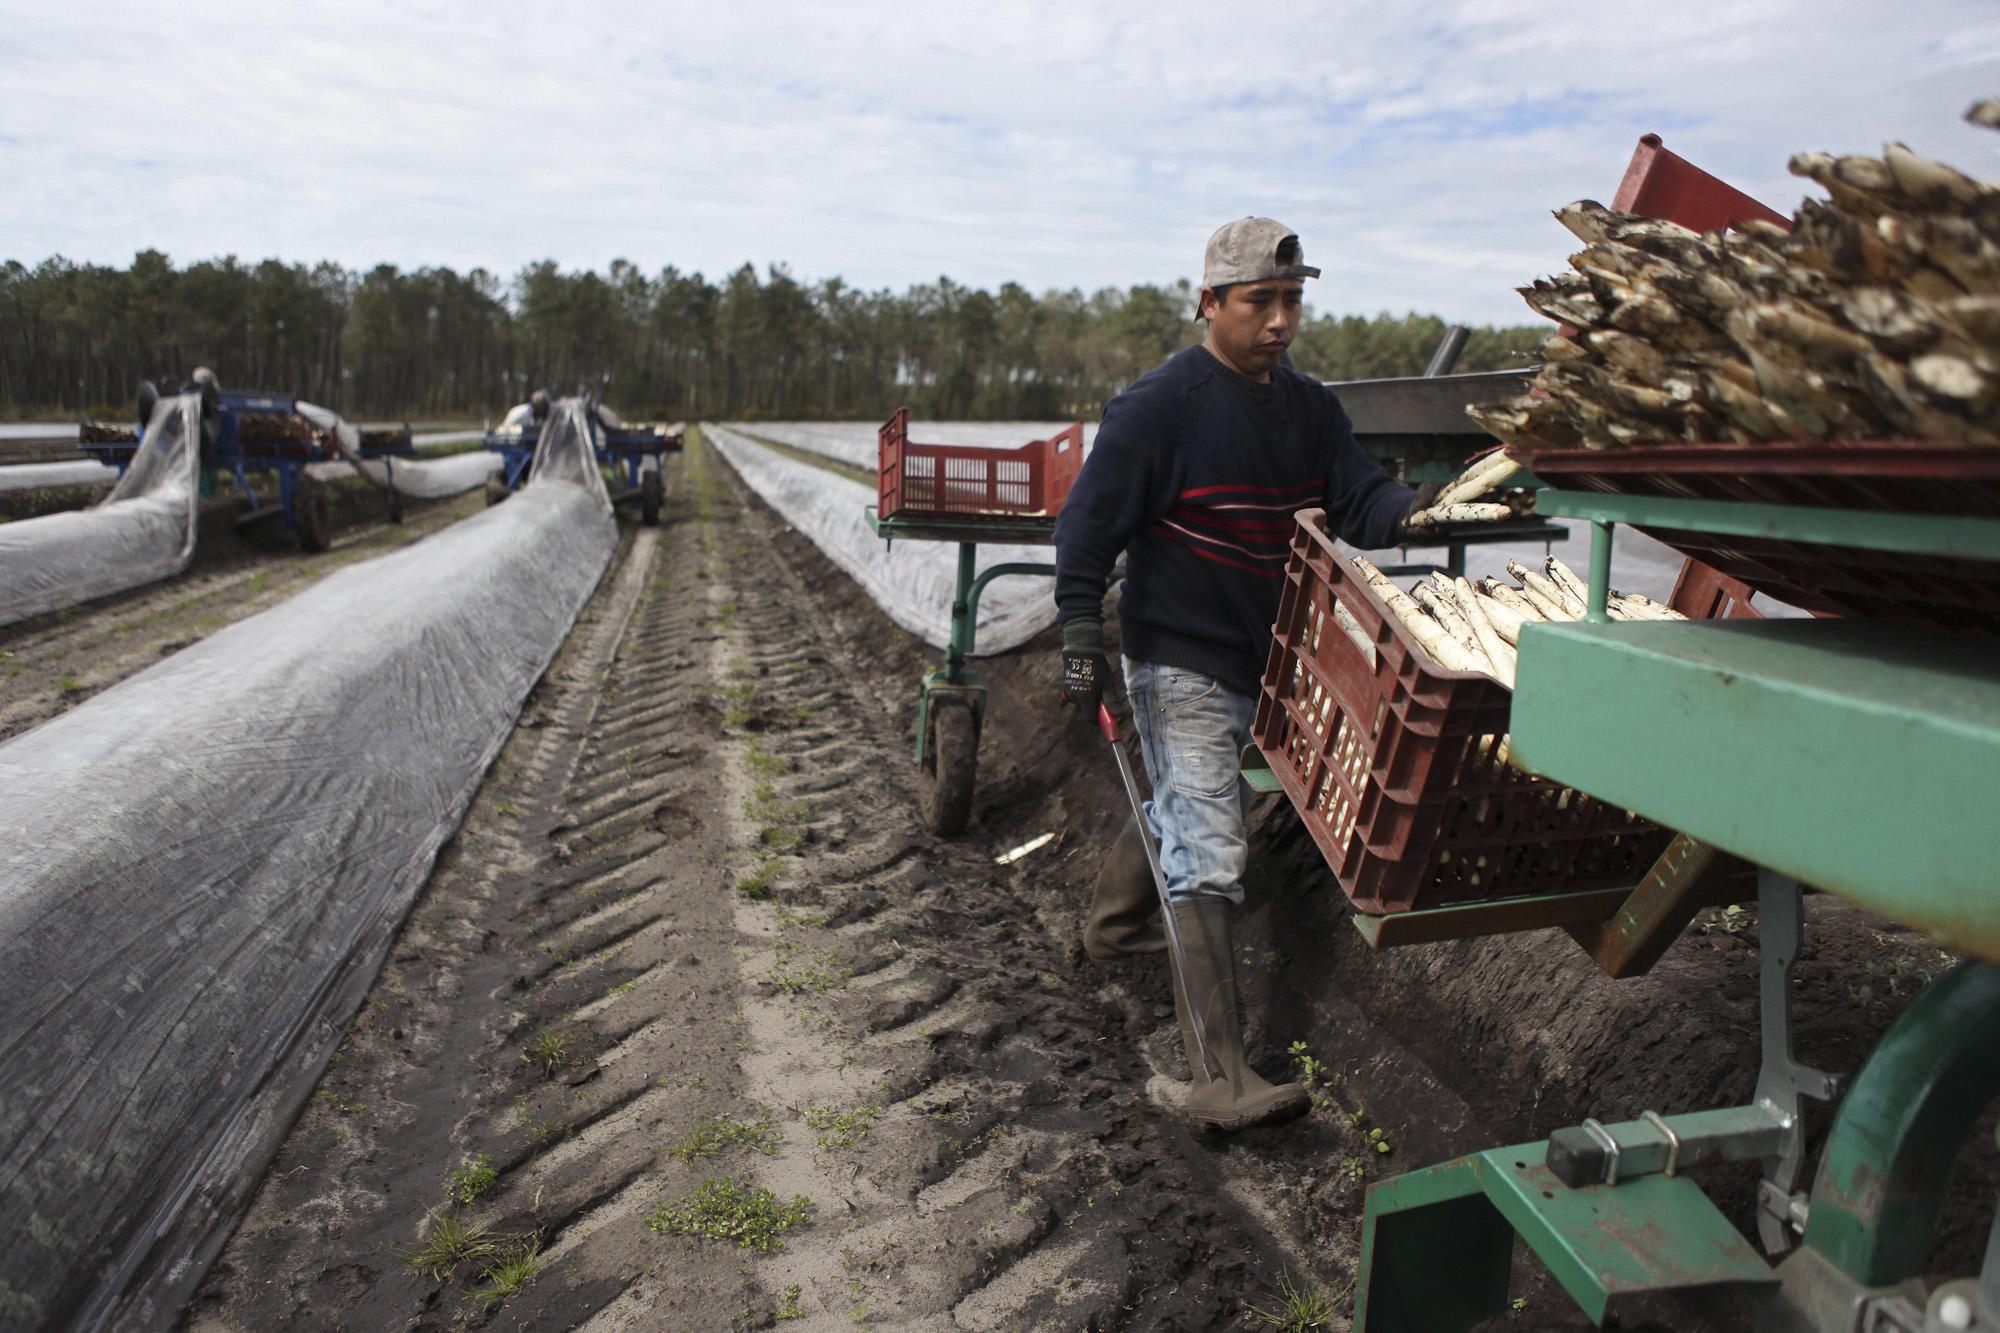 Francis and Michel Lalanne's Asparagus Farm. Ecuadorian workers harvesting white asparagus.